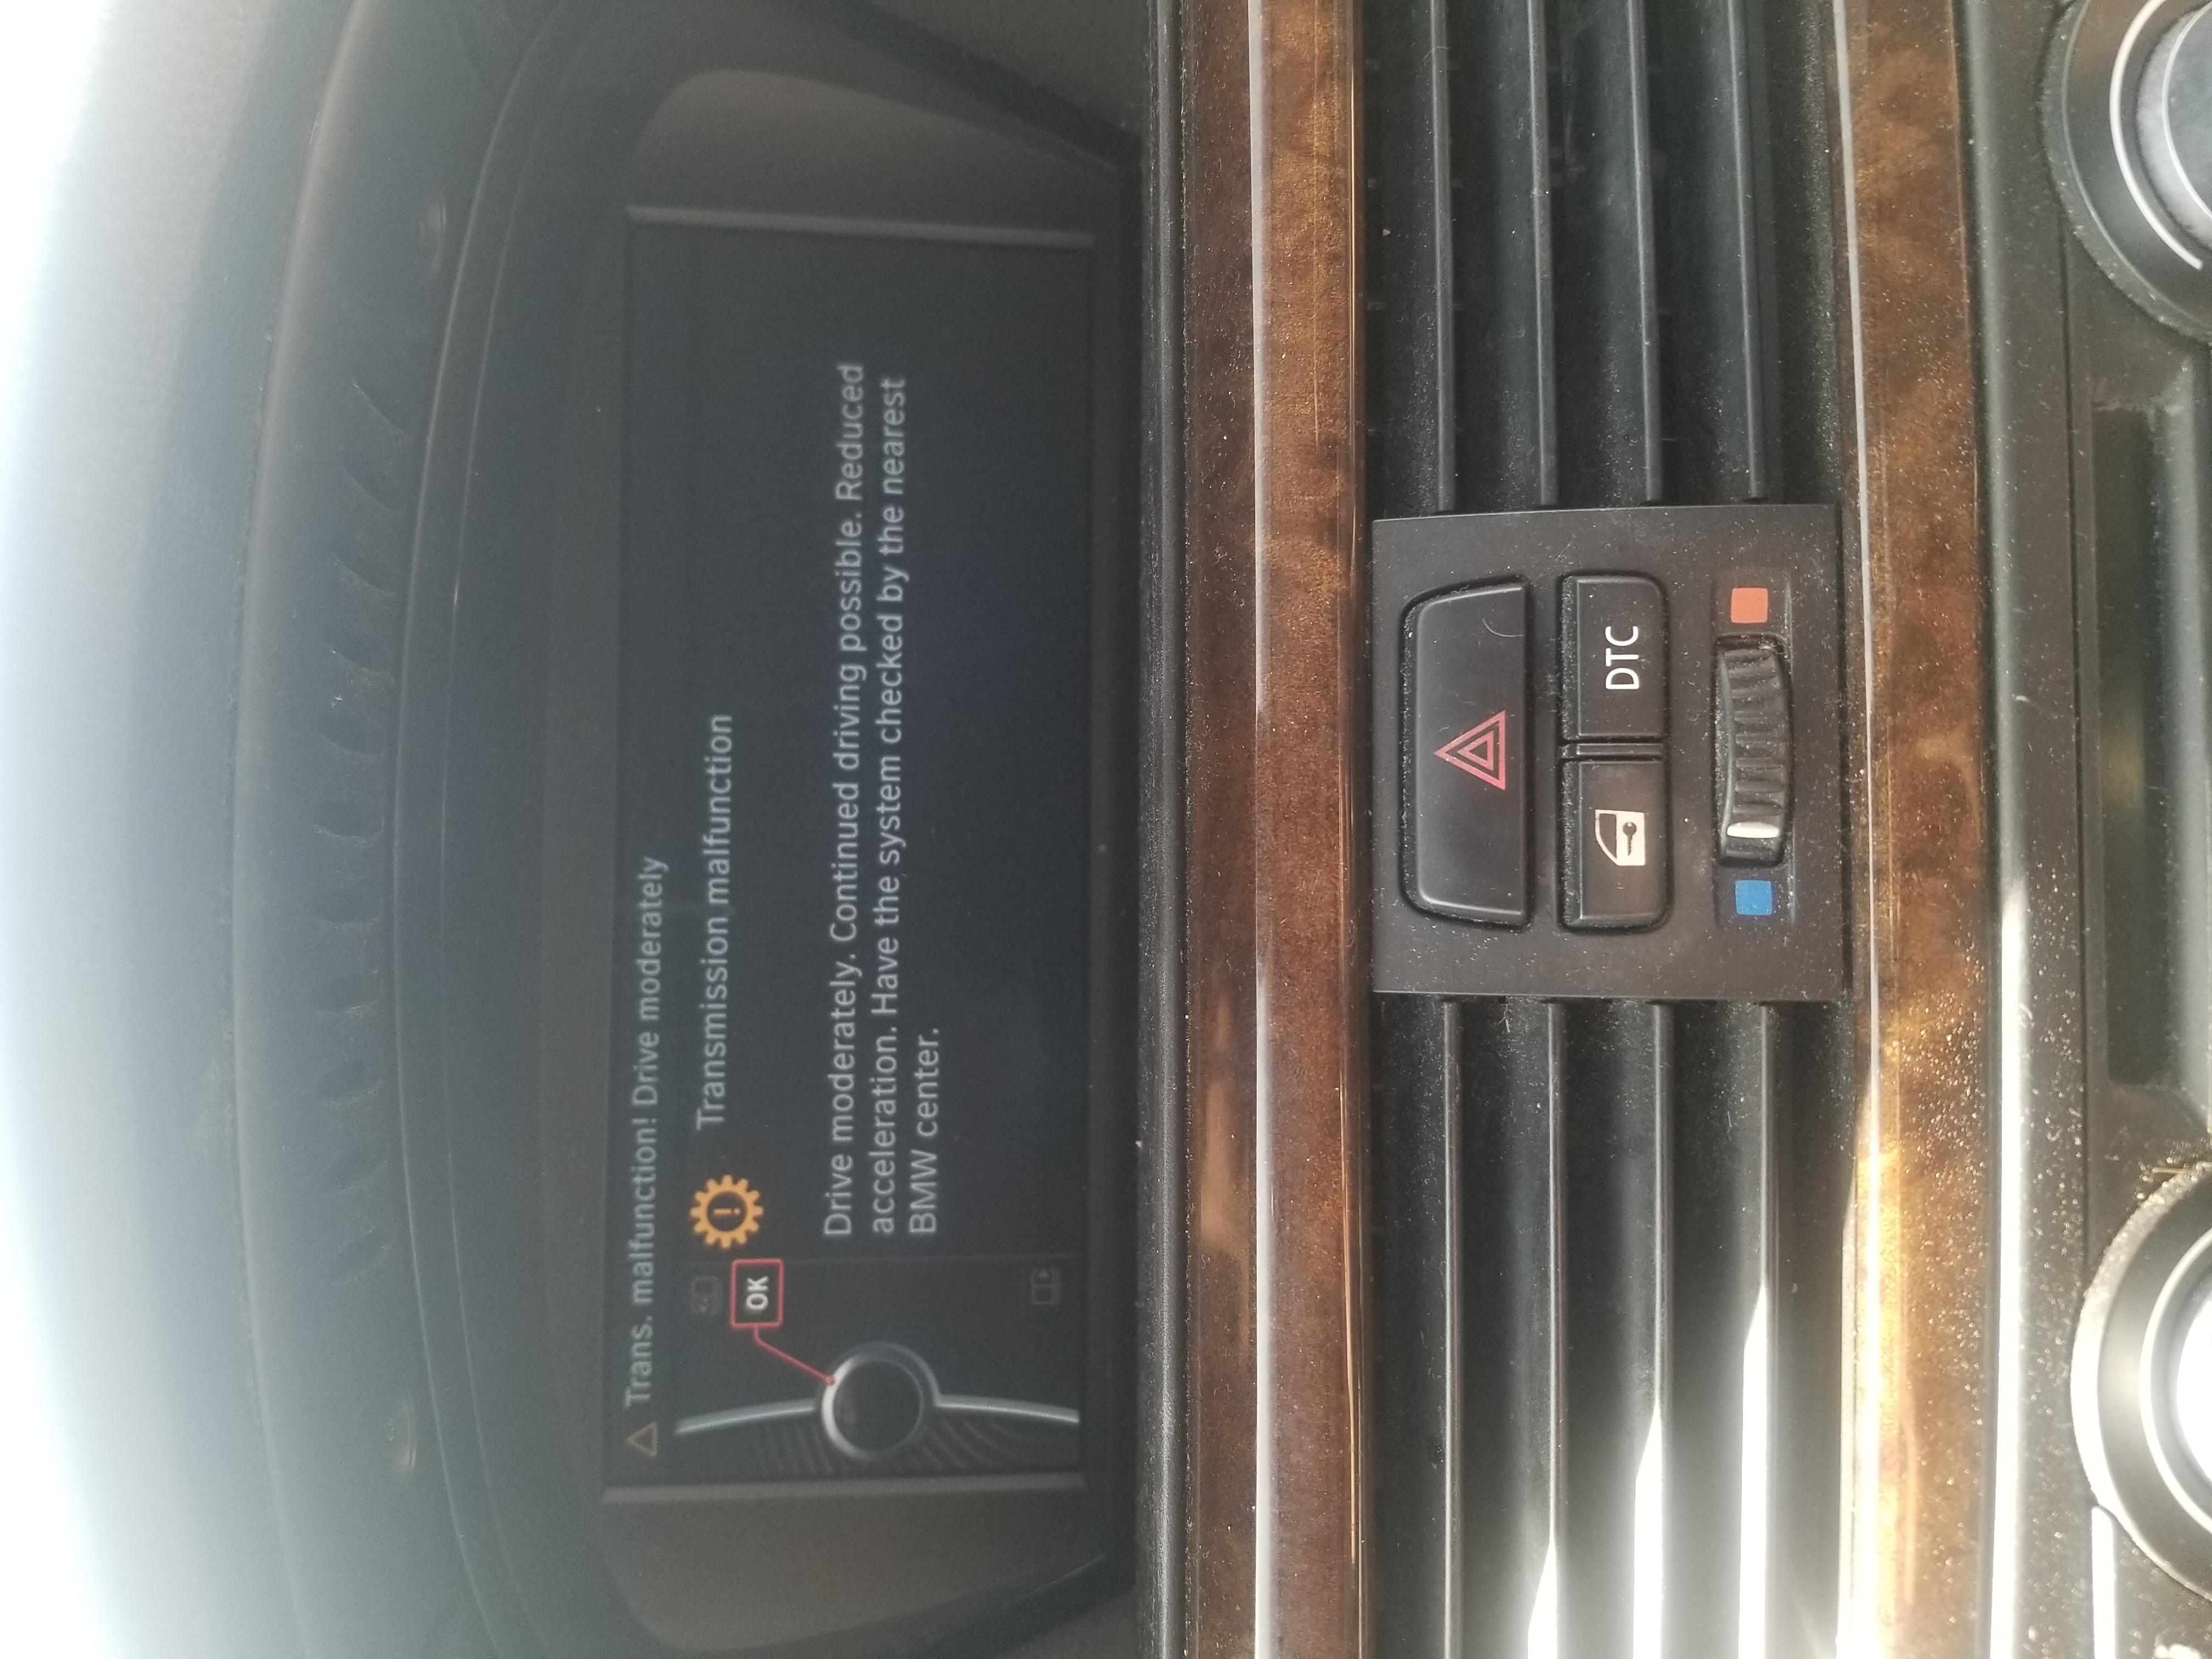 I am having car problems i need help diagnosing  Bmw 328i